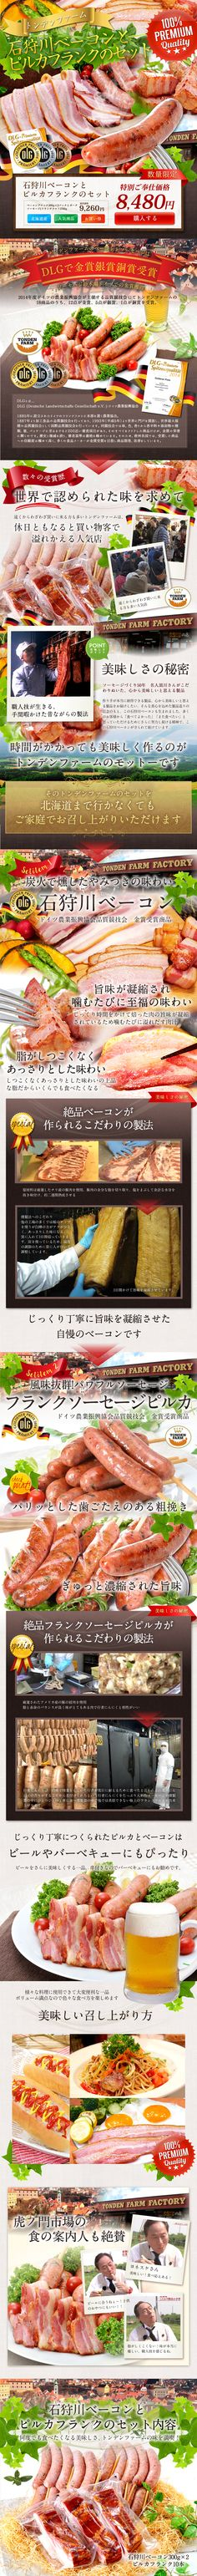 LPデザイン-虎ノ門市場 石狩川ベーコンとピルカフランクセット